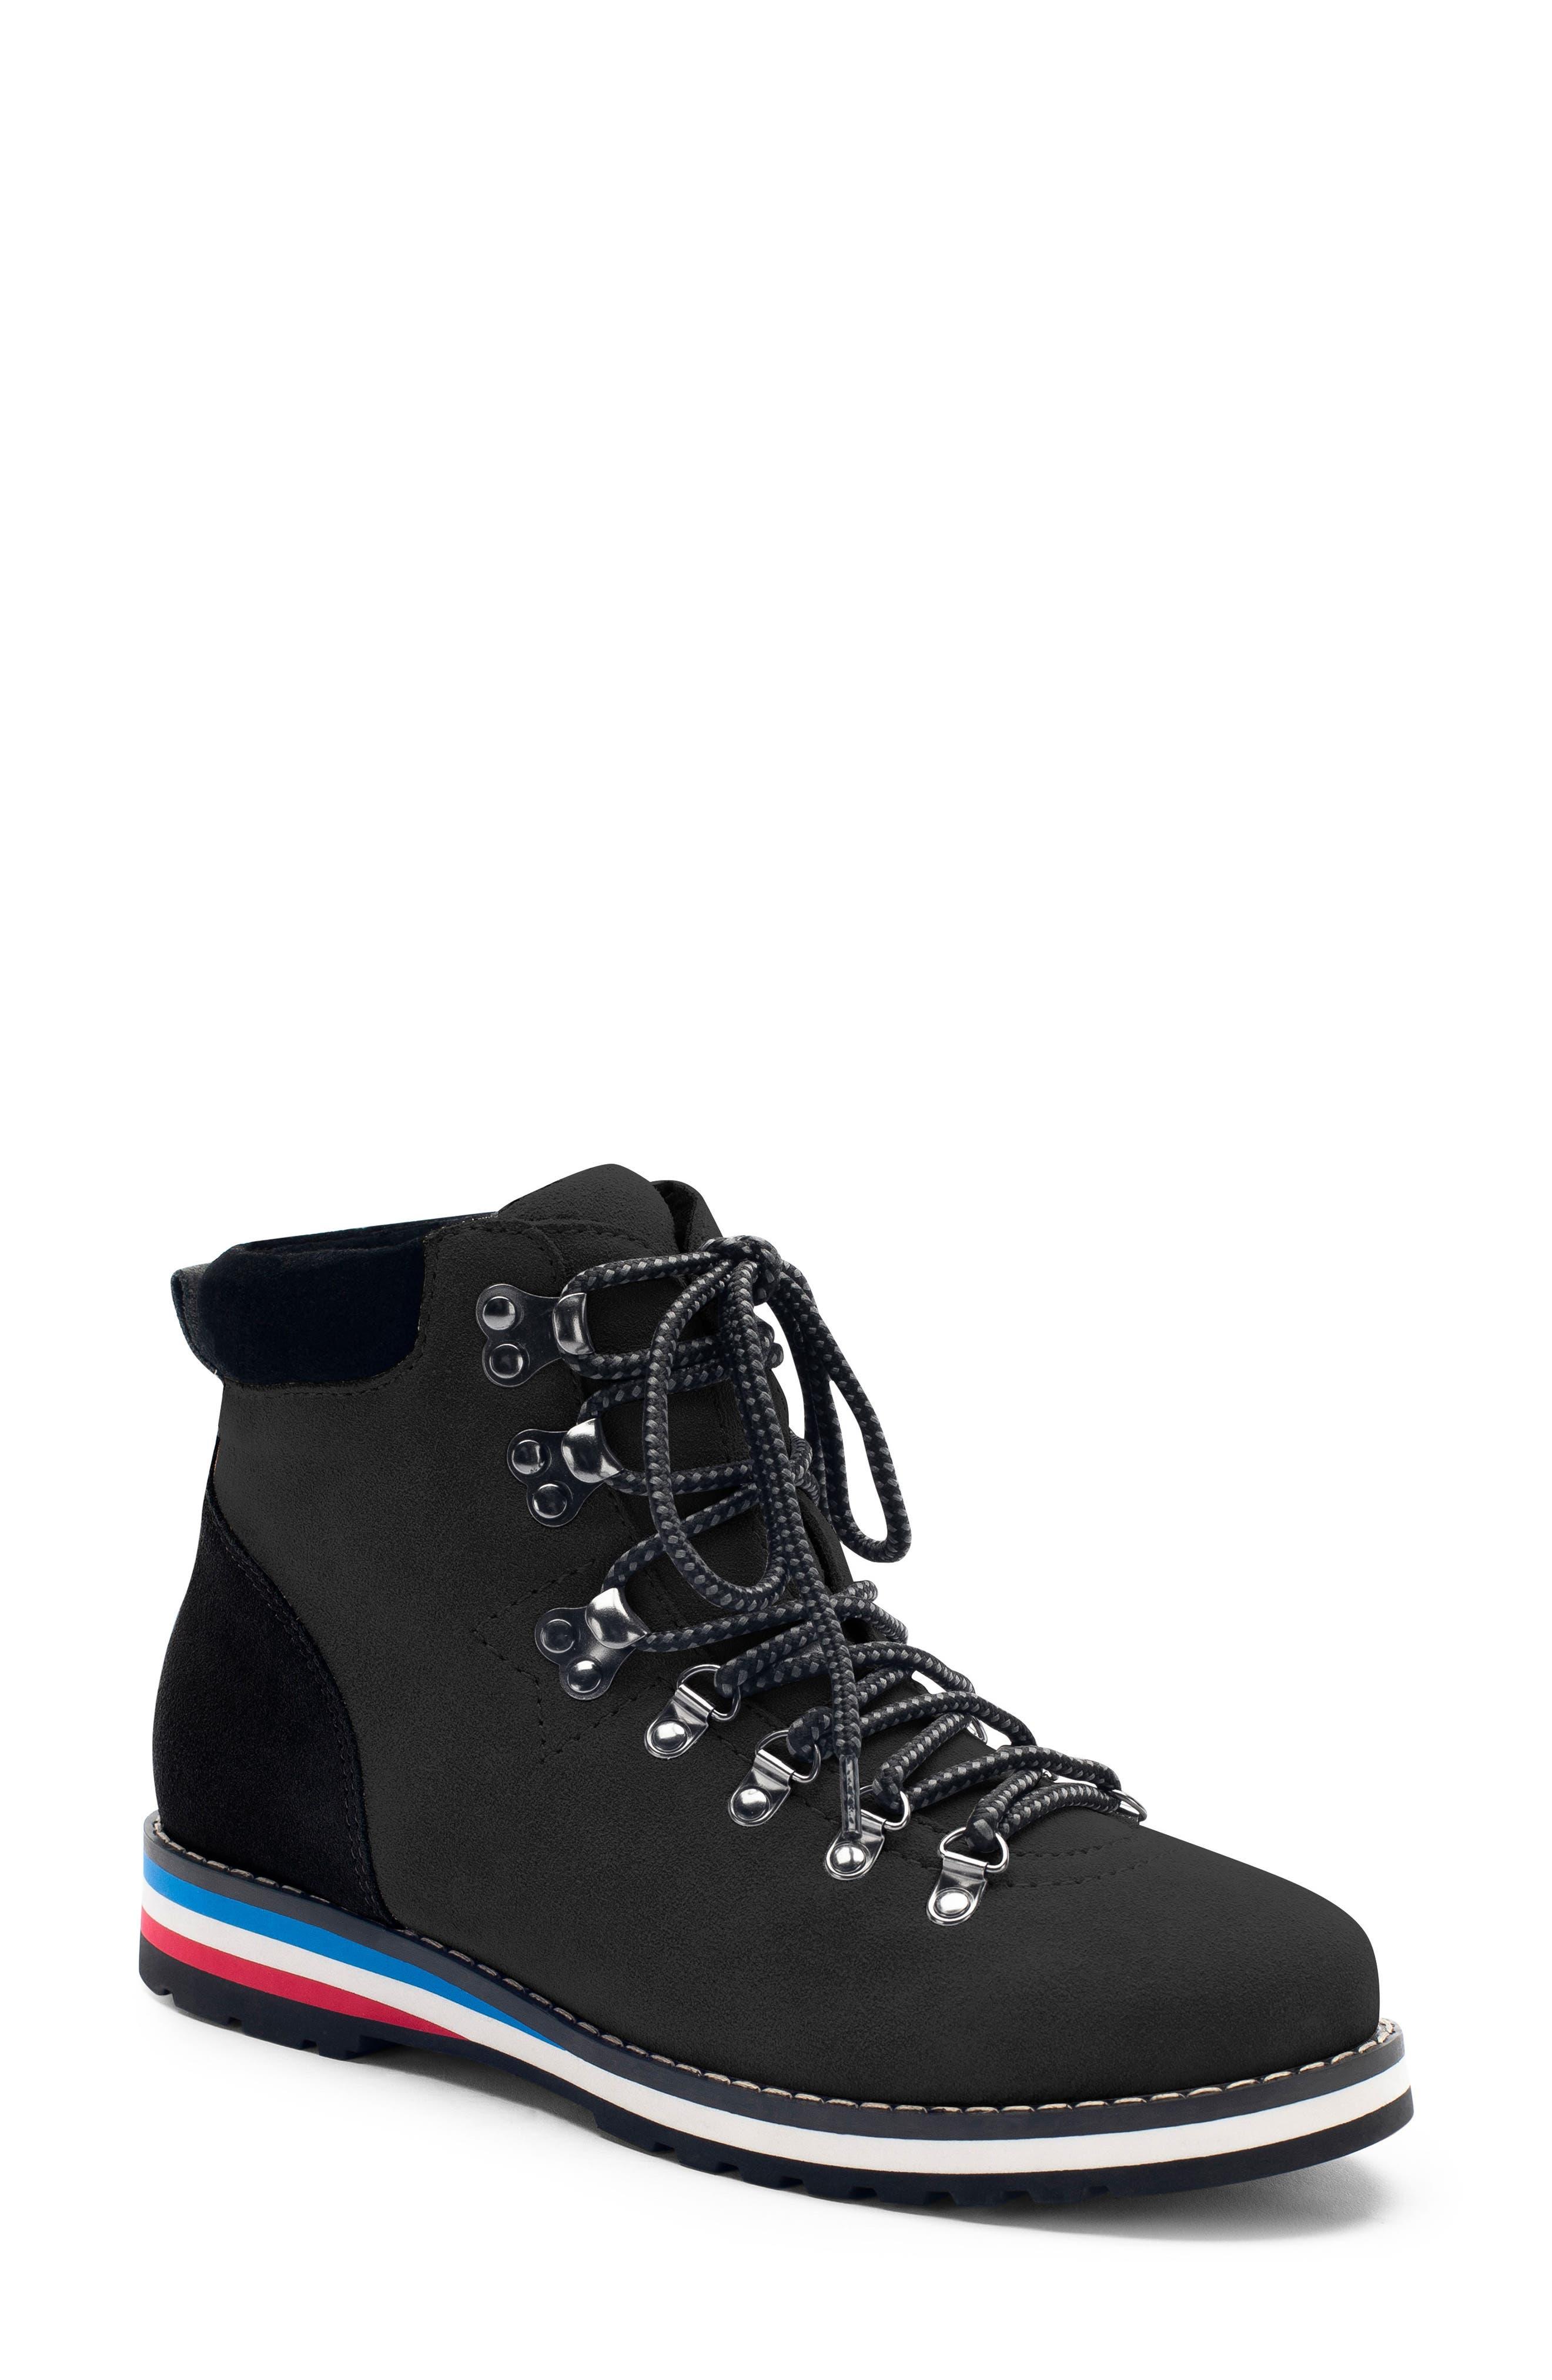 Image of Blondo Regan Waterproof Lace-Up Boot